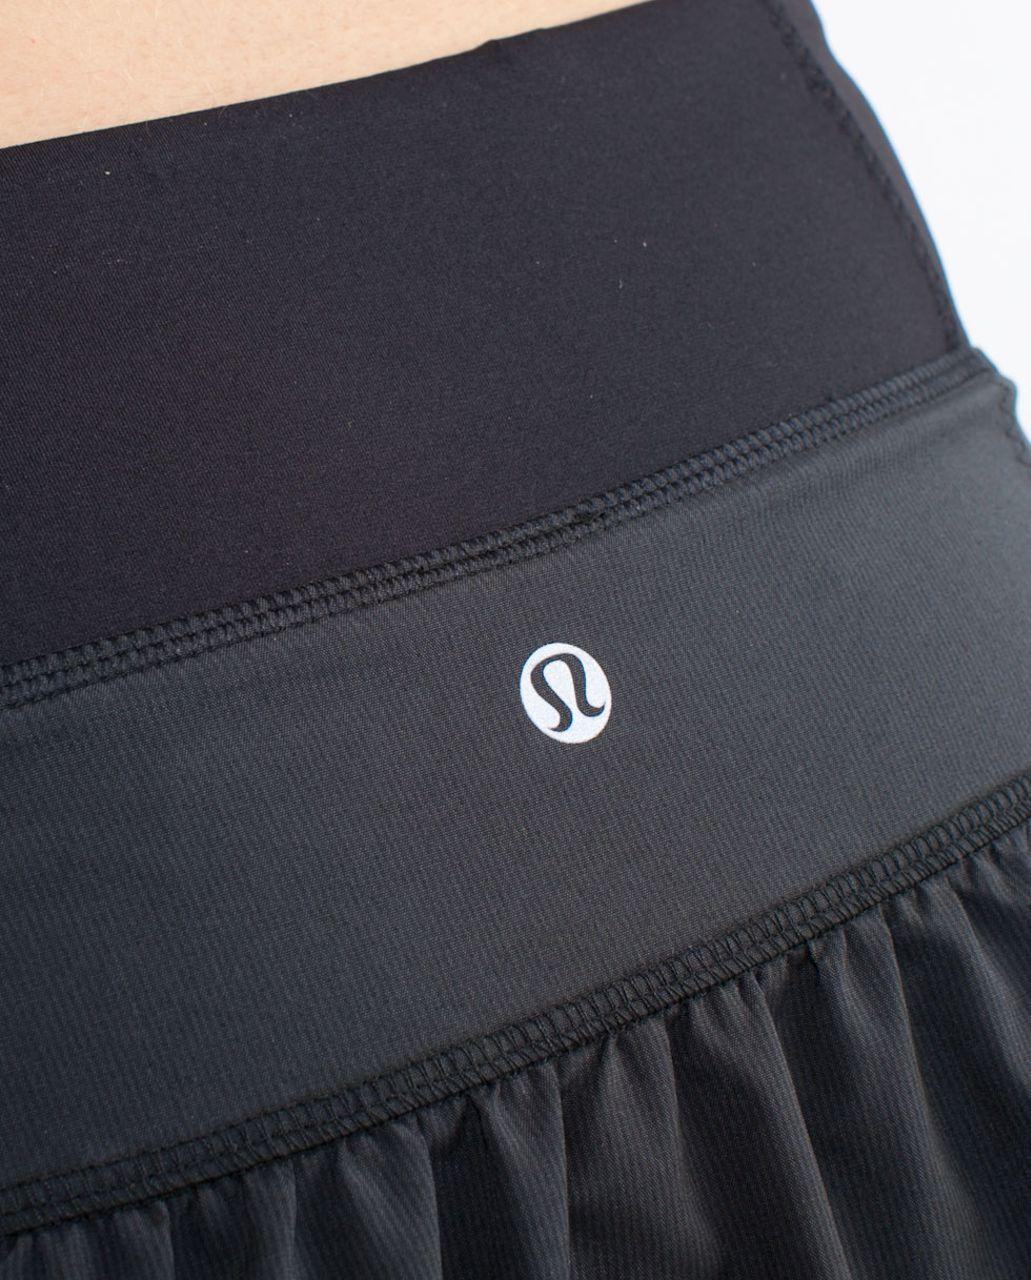 Lululemon Run:  Your Heart Out Skirt - Black Black Teeny Stripe /  Black /  Make Davie Run Crazy Print